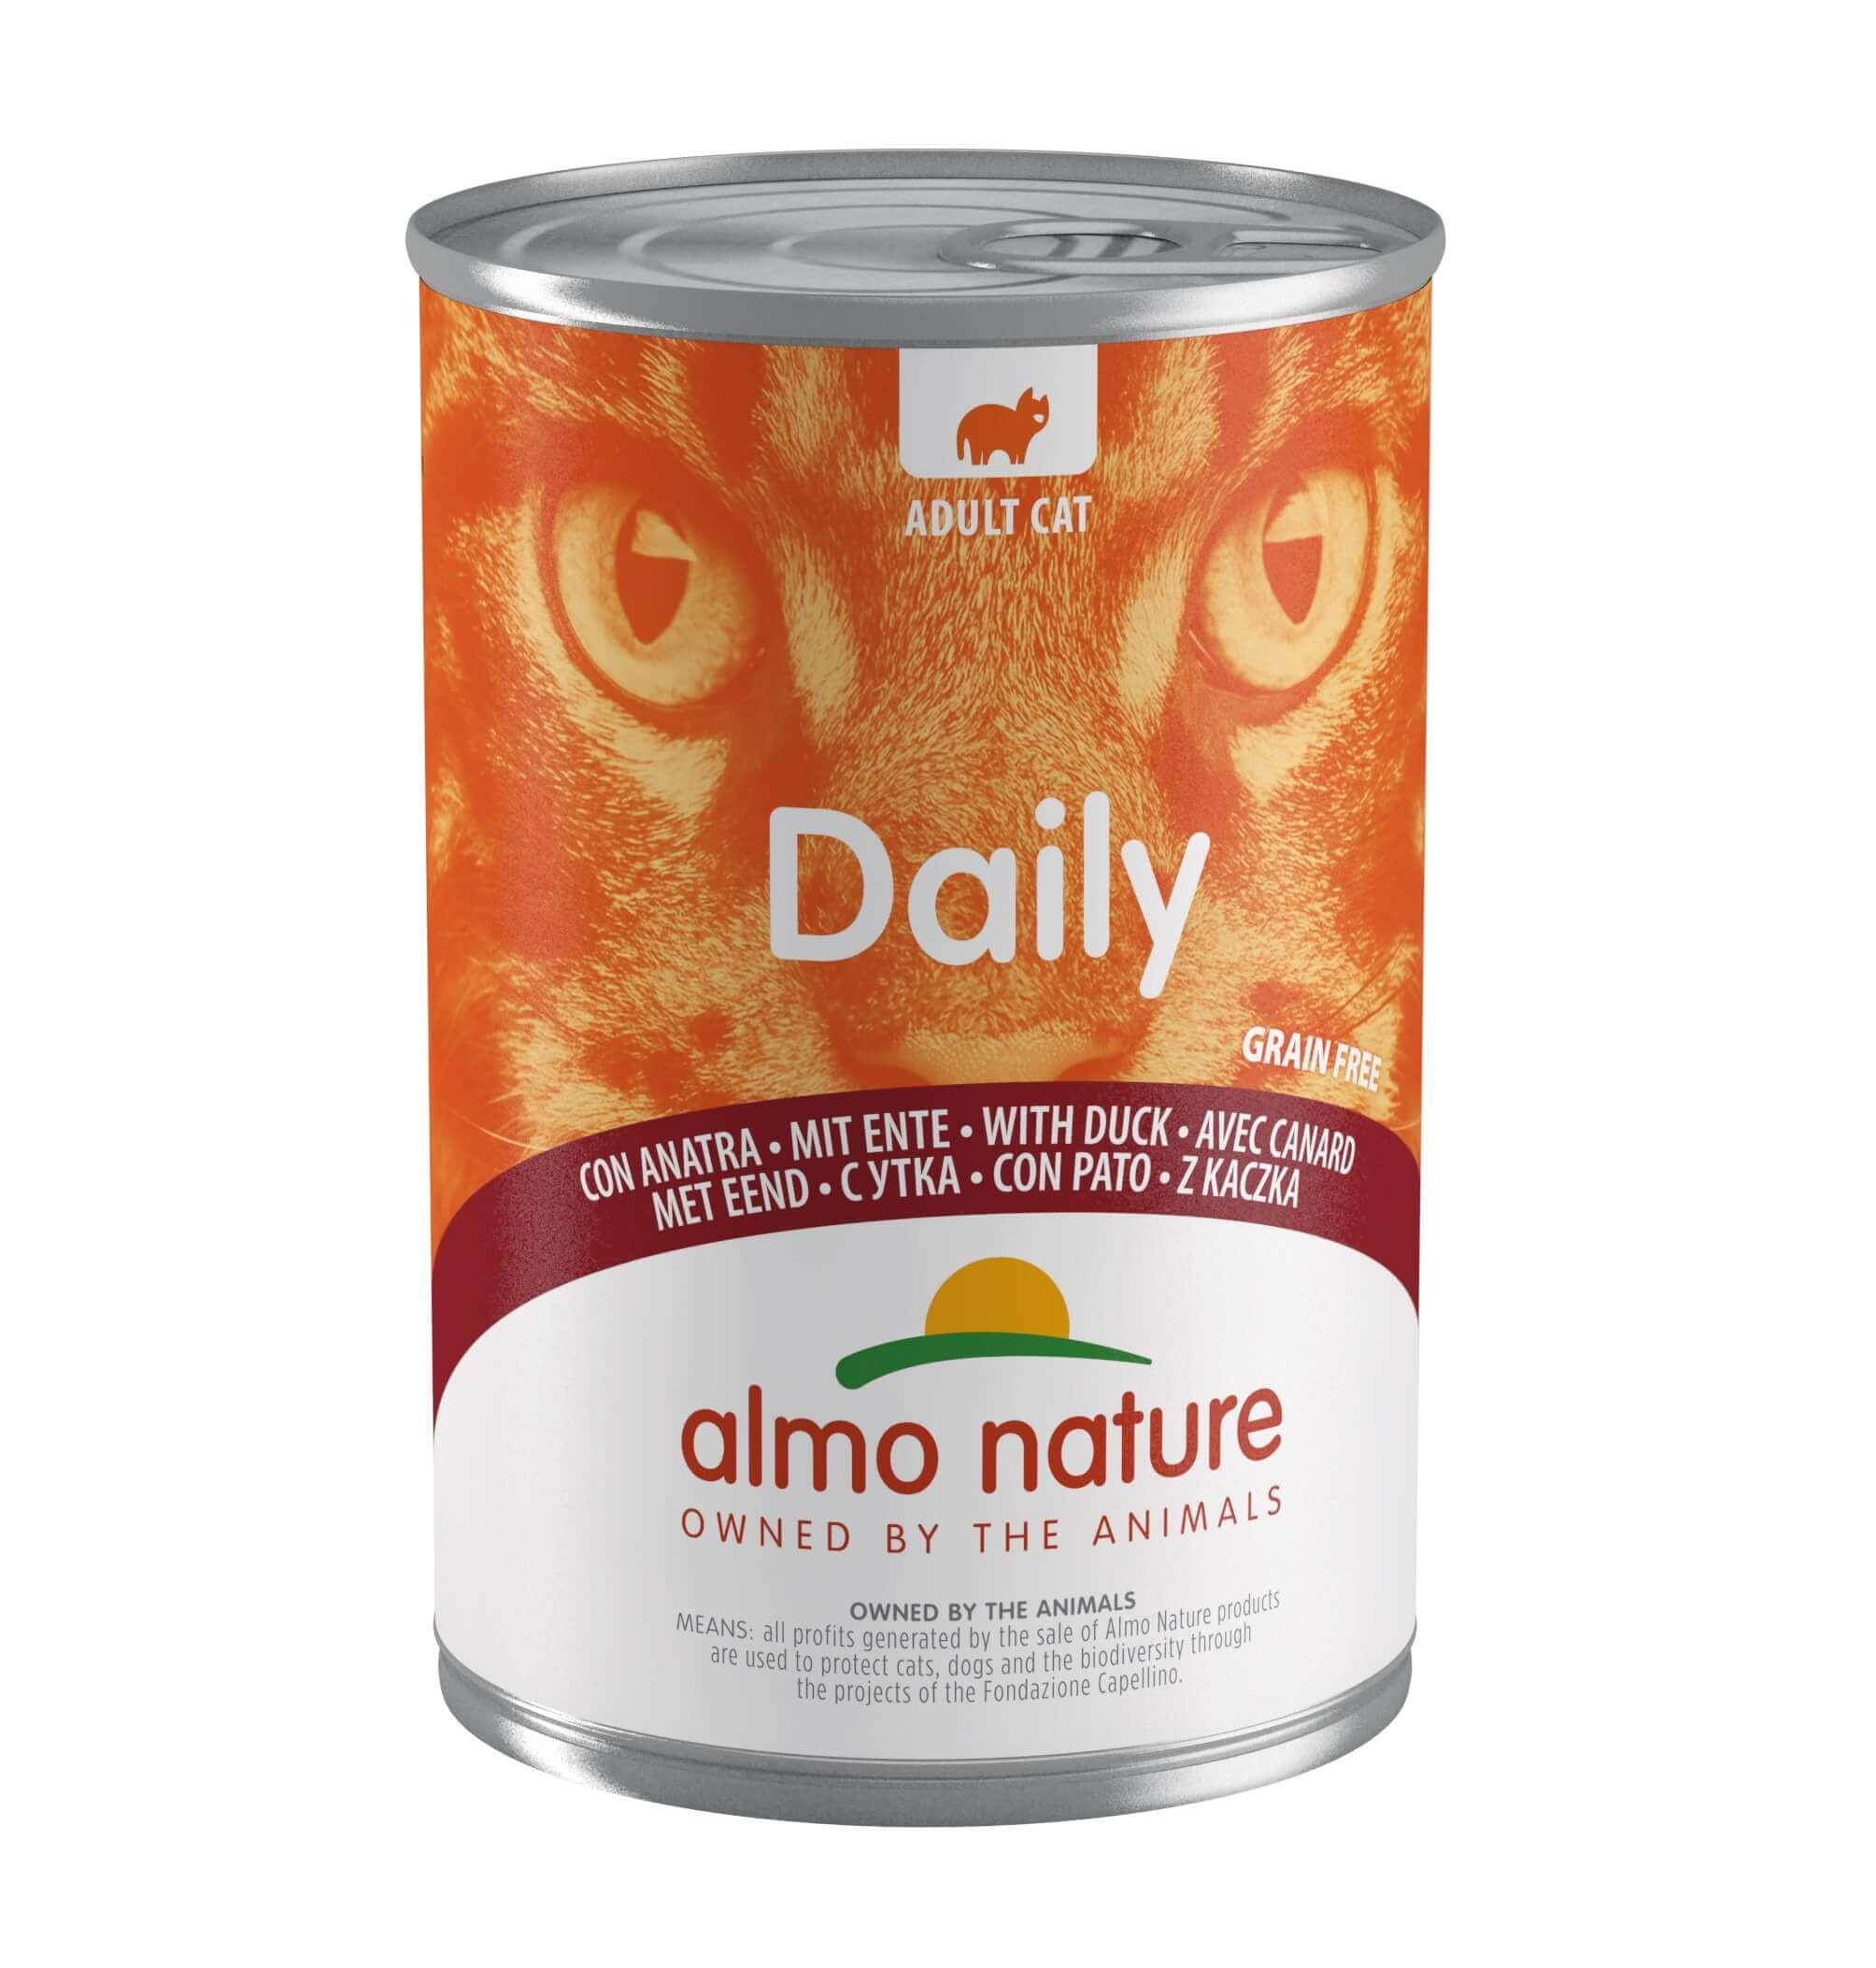 Almo Nature Daily Ente 400g